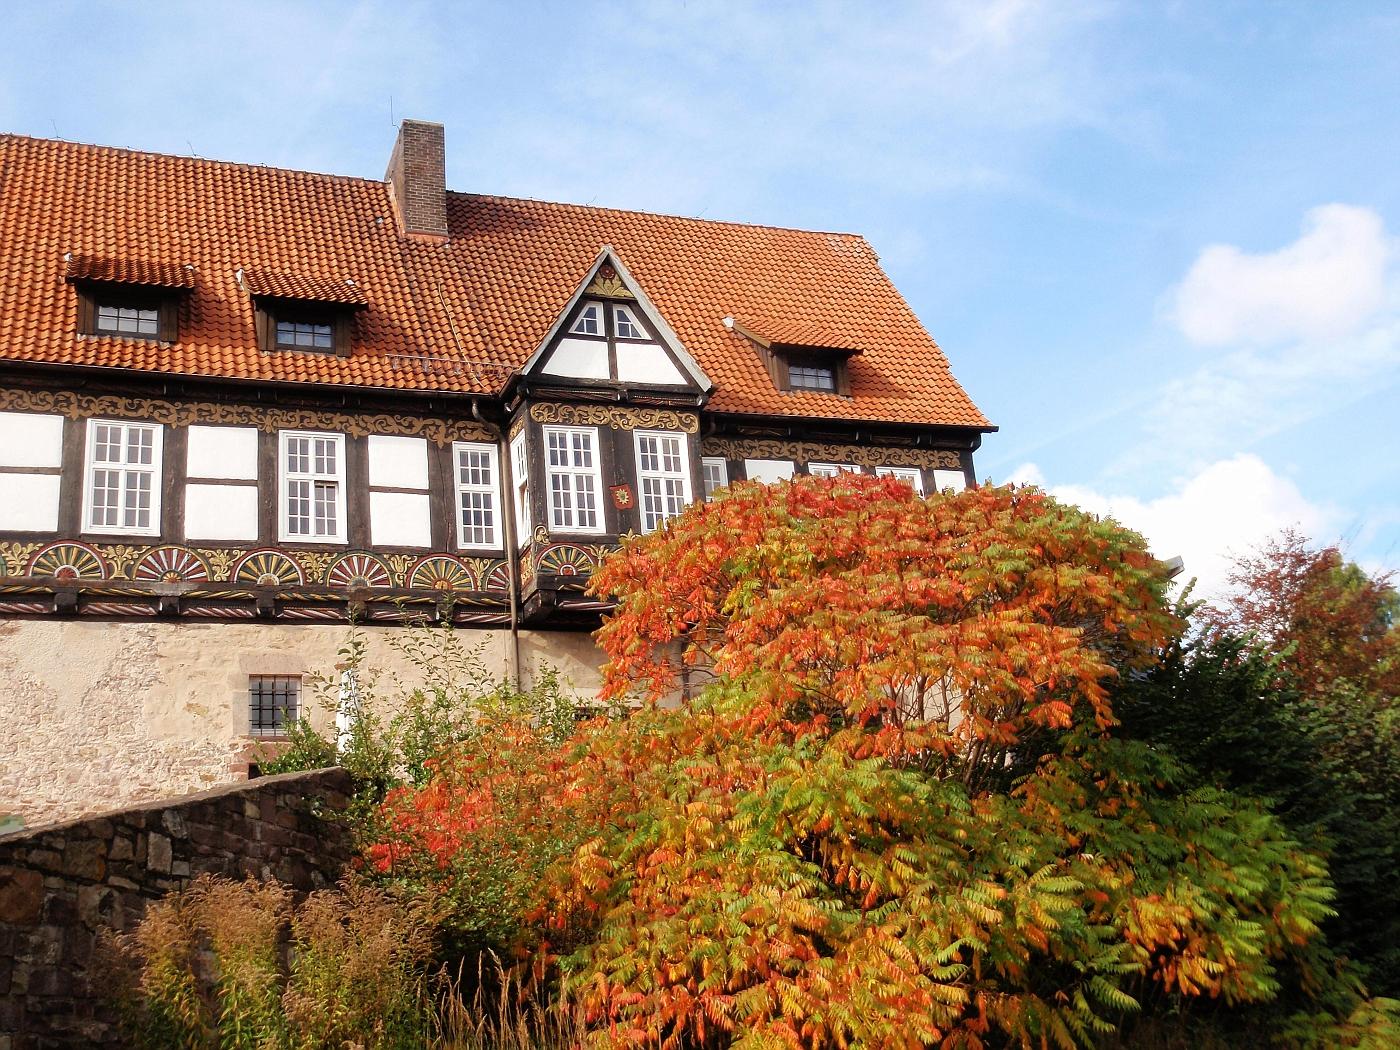 Burg Blomberg